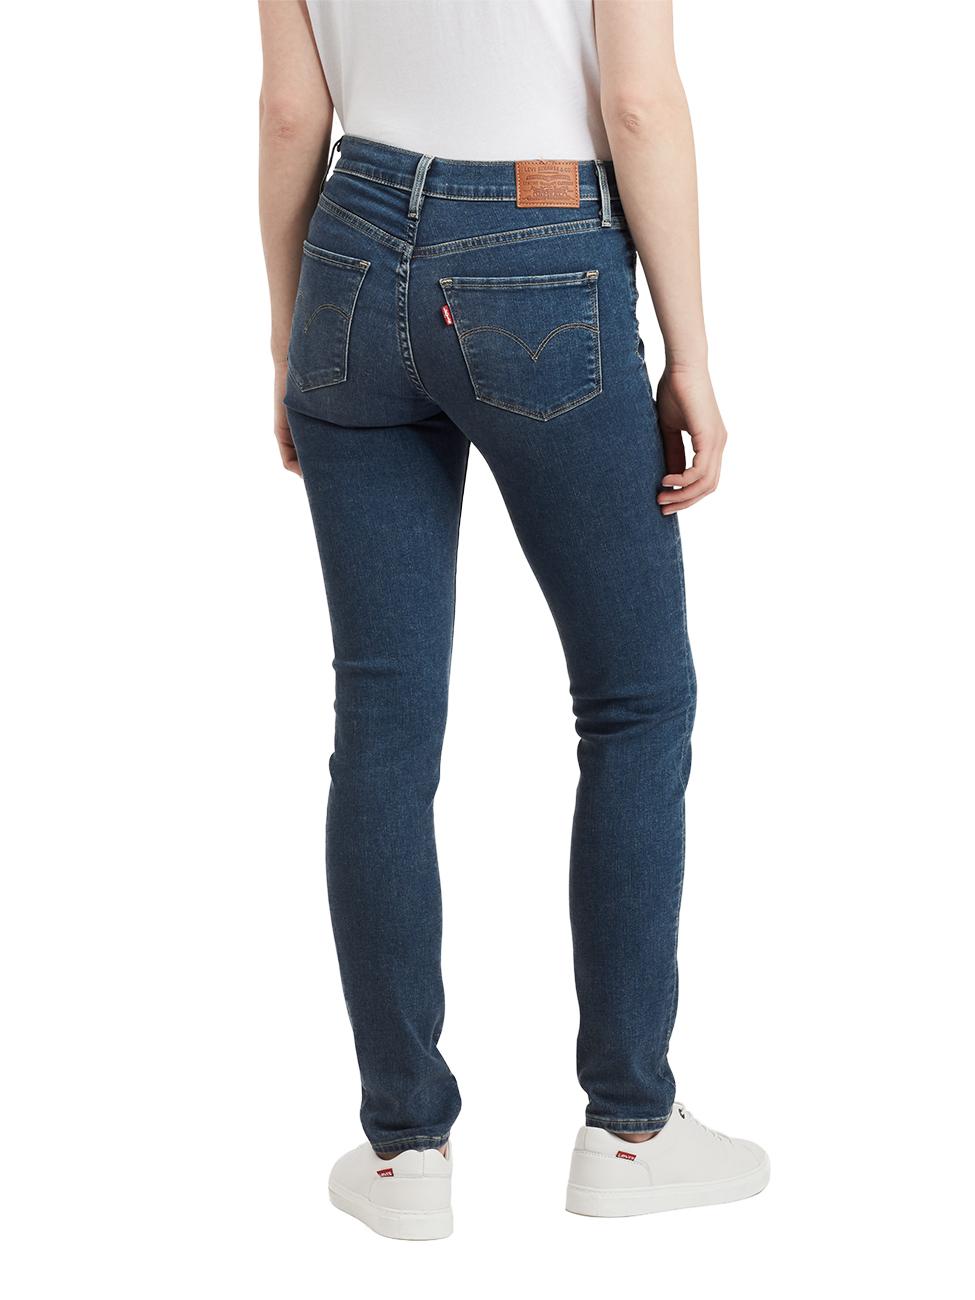 levis-damen-jeans-311-shaping-skinny-fit-blau-paris-fade